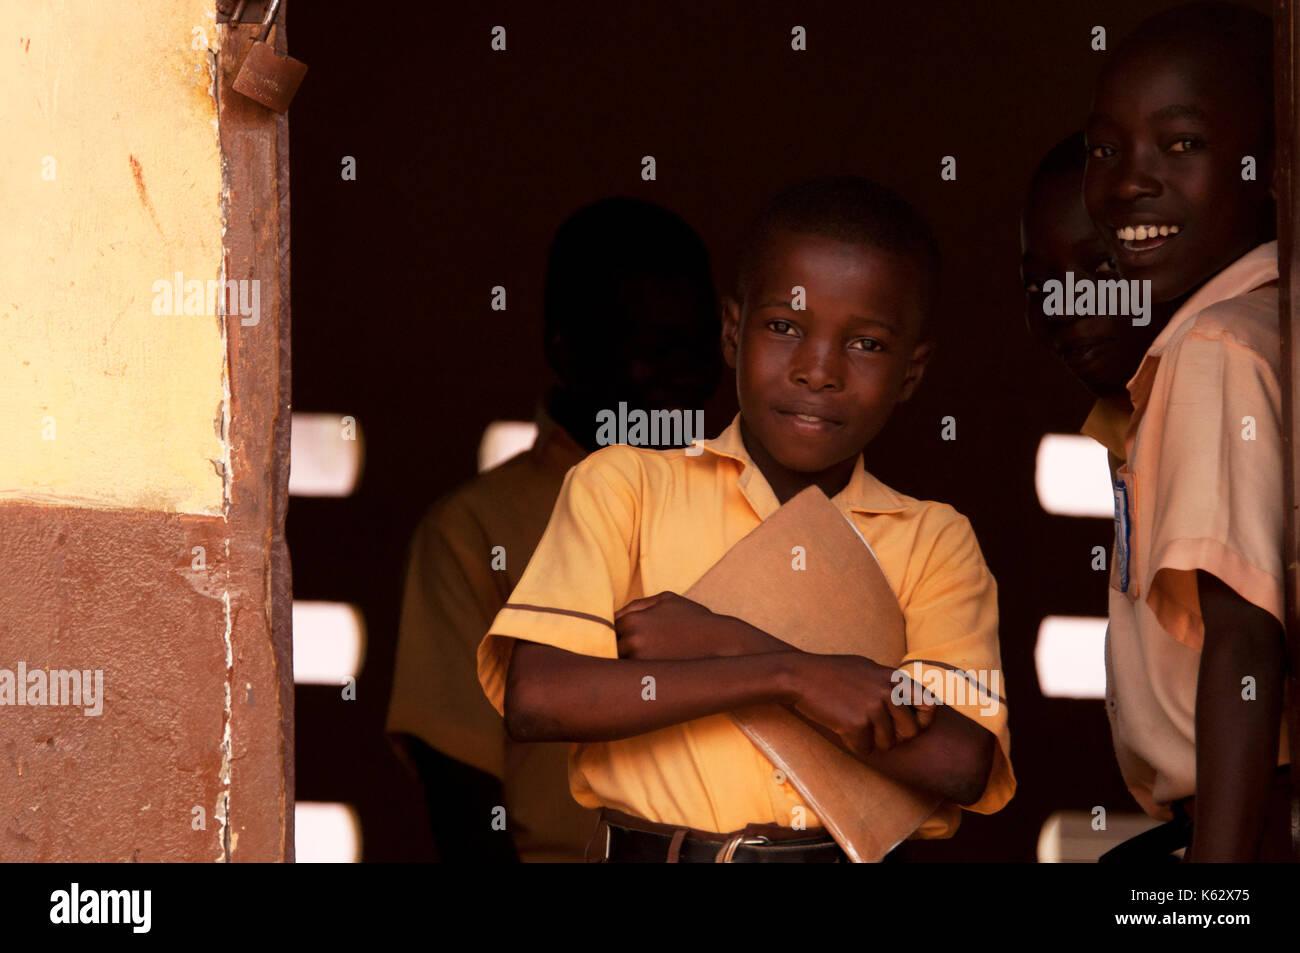 Pupils - Stock Image